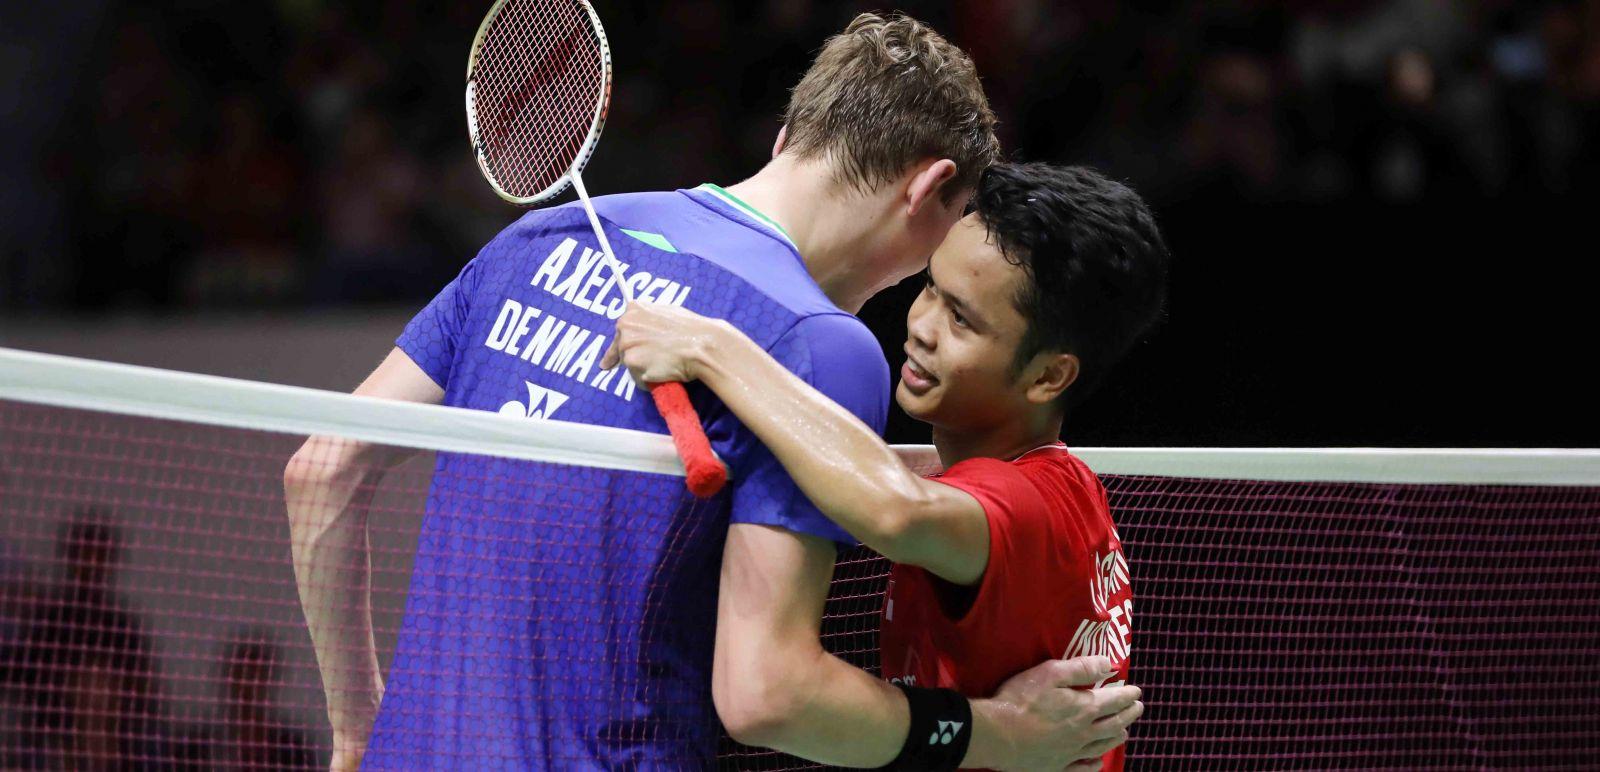 Tunggal putra Anthony Sinisuka Ginting tampil luar biasa pada semifinal Indonesia Masters 2020. Foto: PBSI